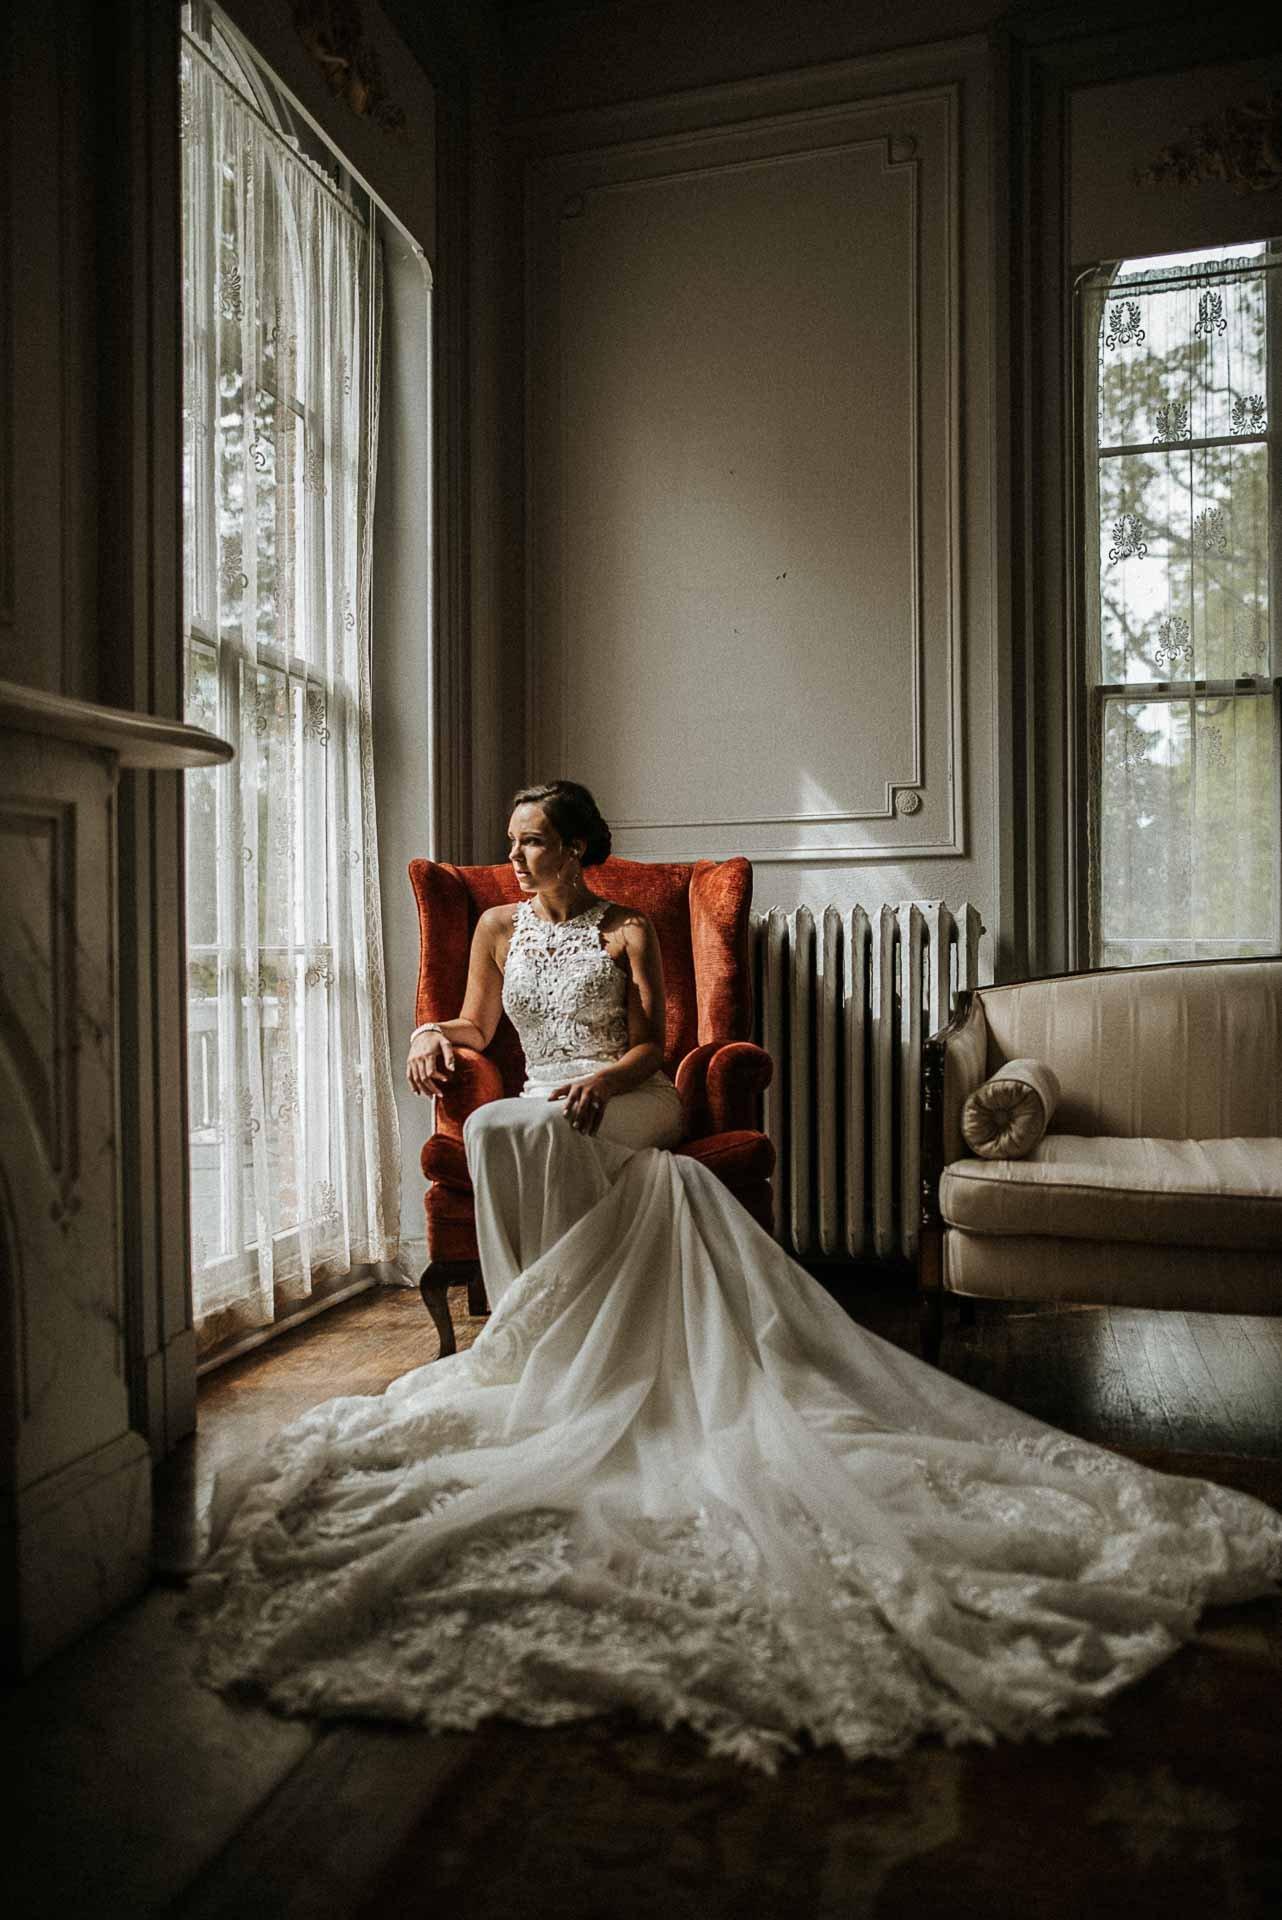 Memphis-Wedding-Planner-Wedding-Day-Manager-Florist-Wedding-Designer-Floral-Curator-Coordinator-Annesdale-Mansion-Amber-Rhodes-Lapoint